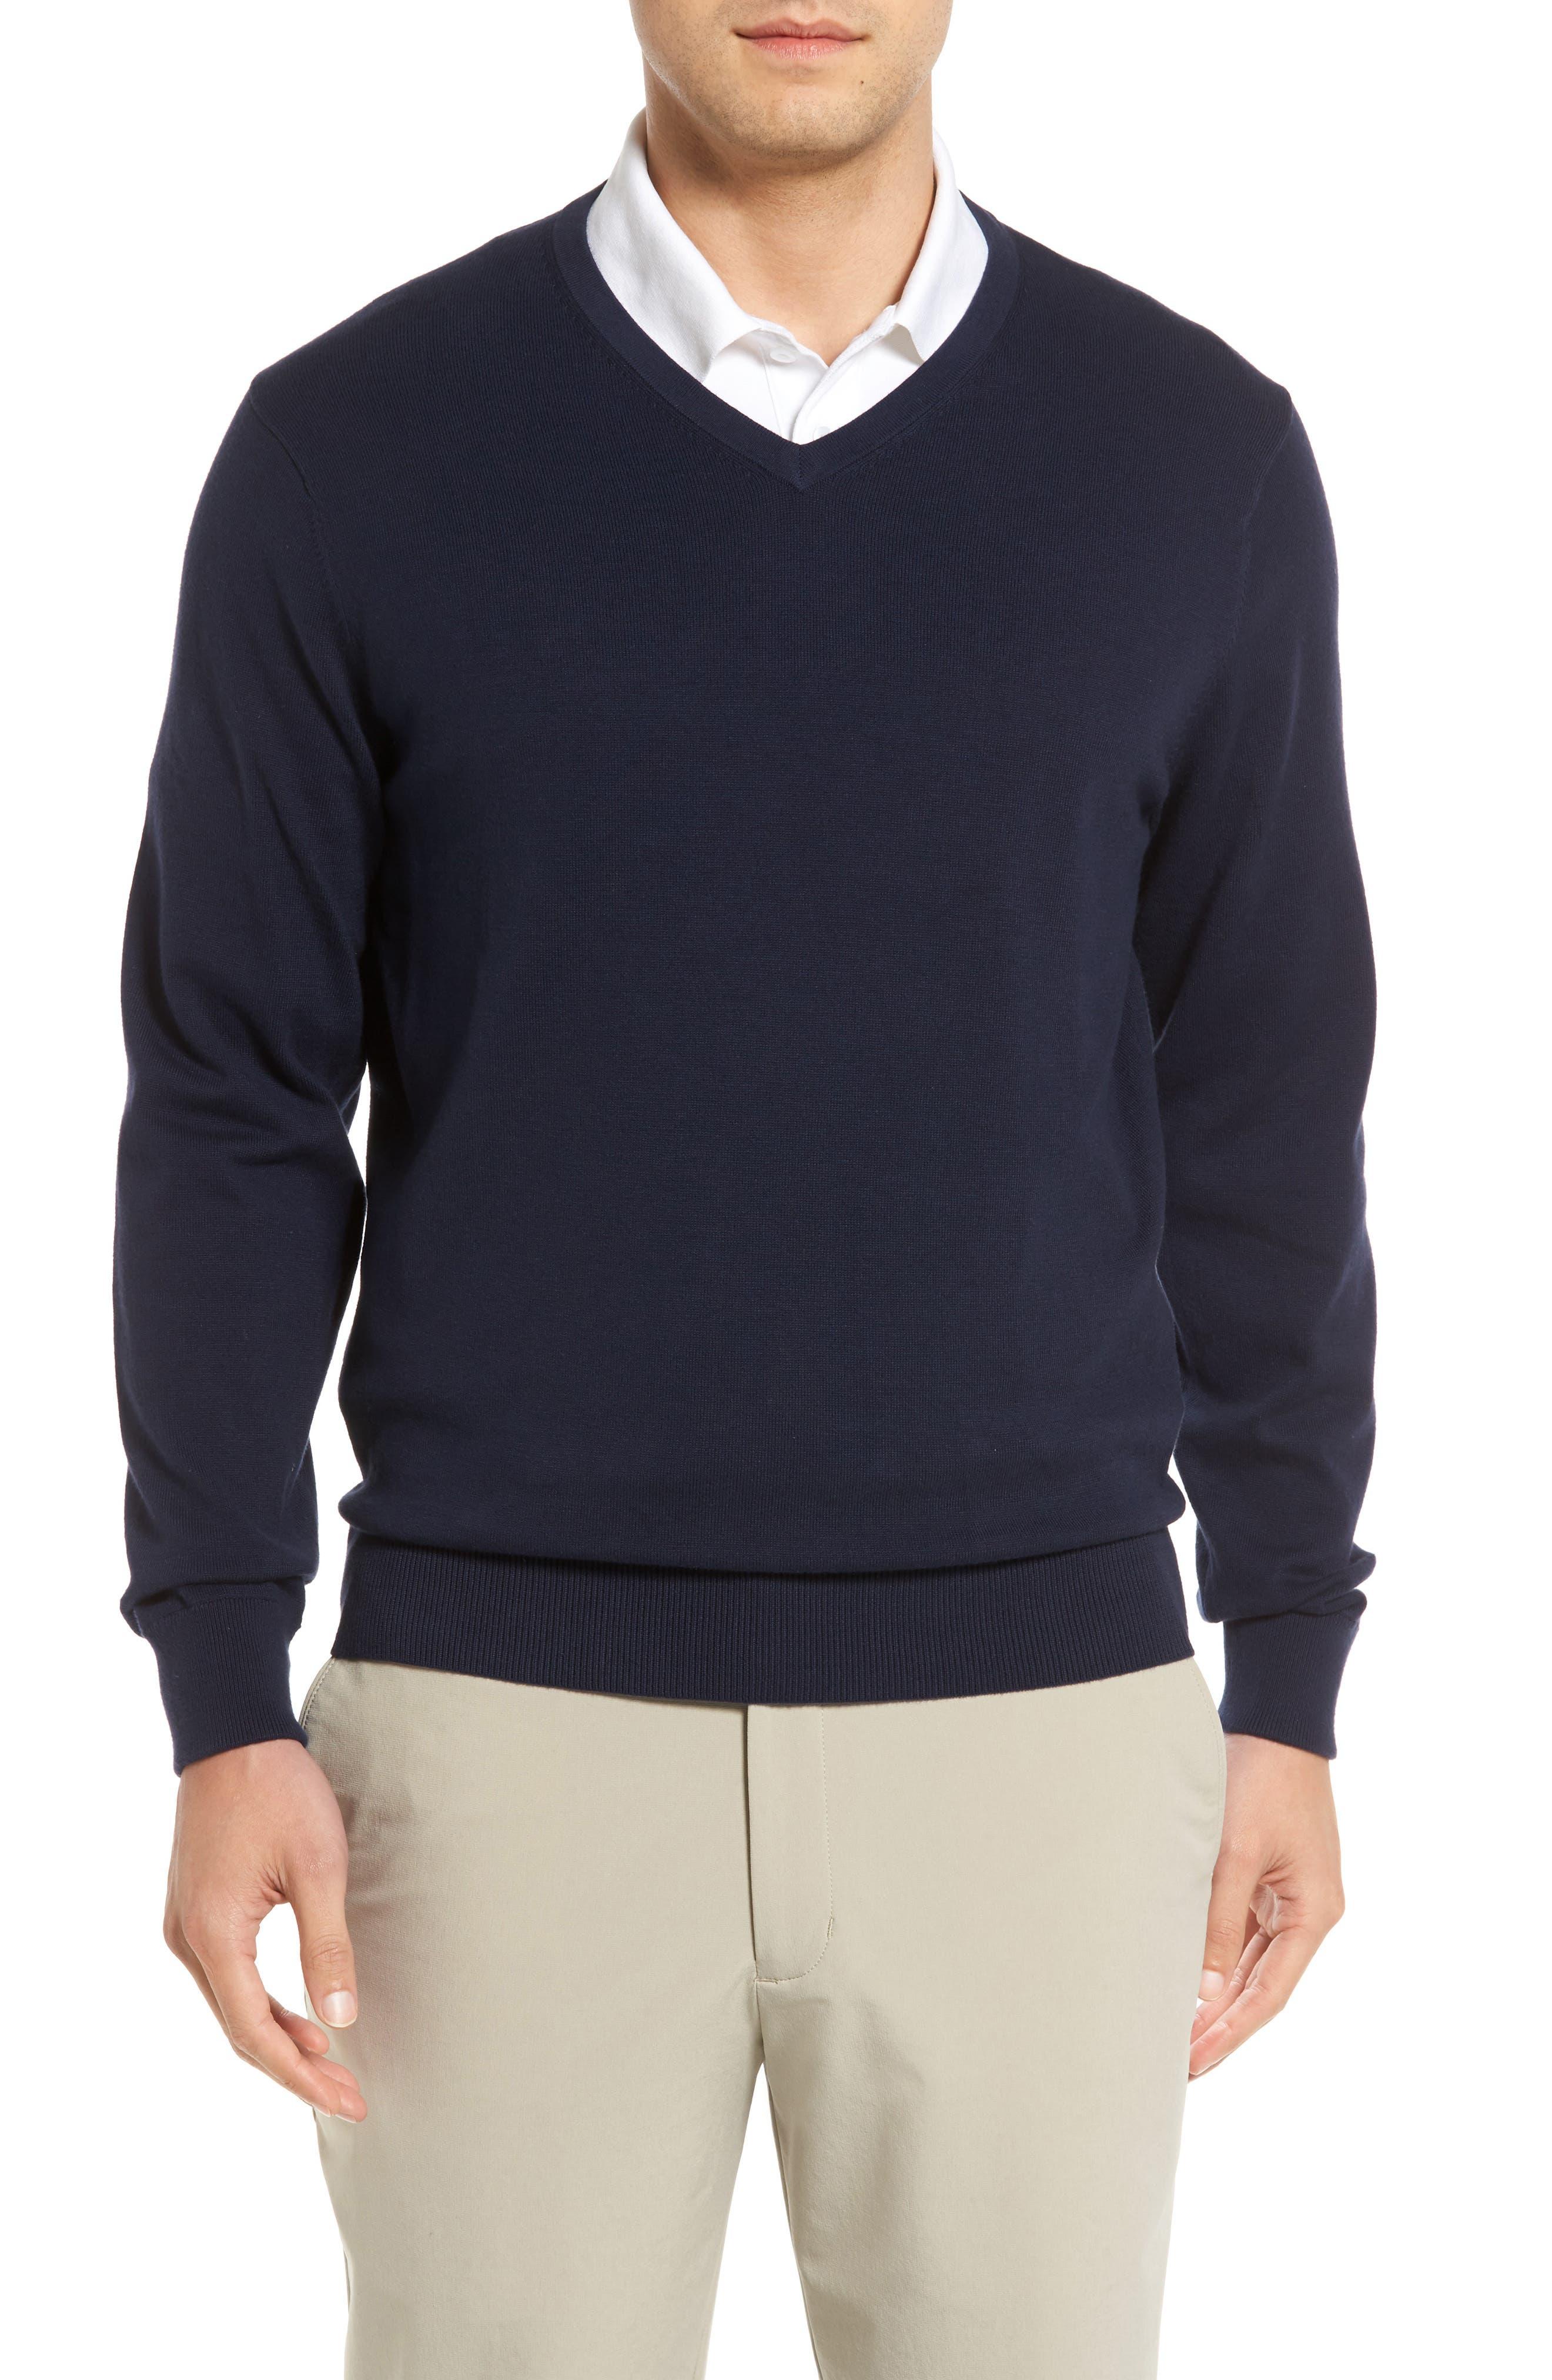 Main Image - Cutter & Buck Lakemont V-Neck Sweater